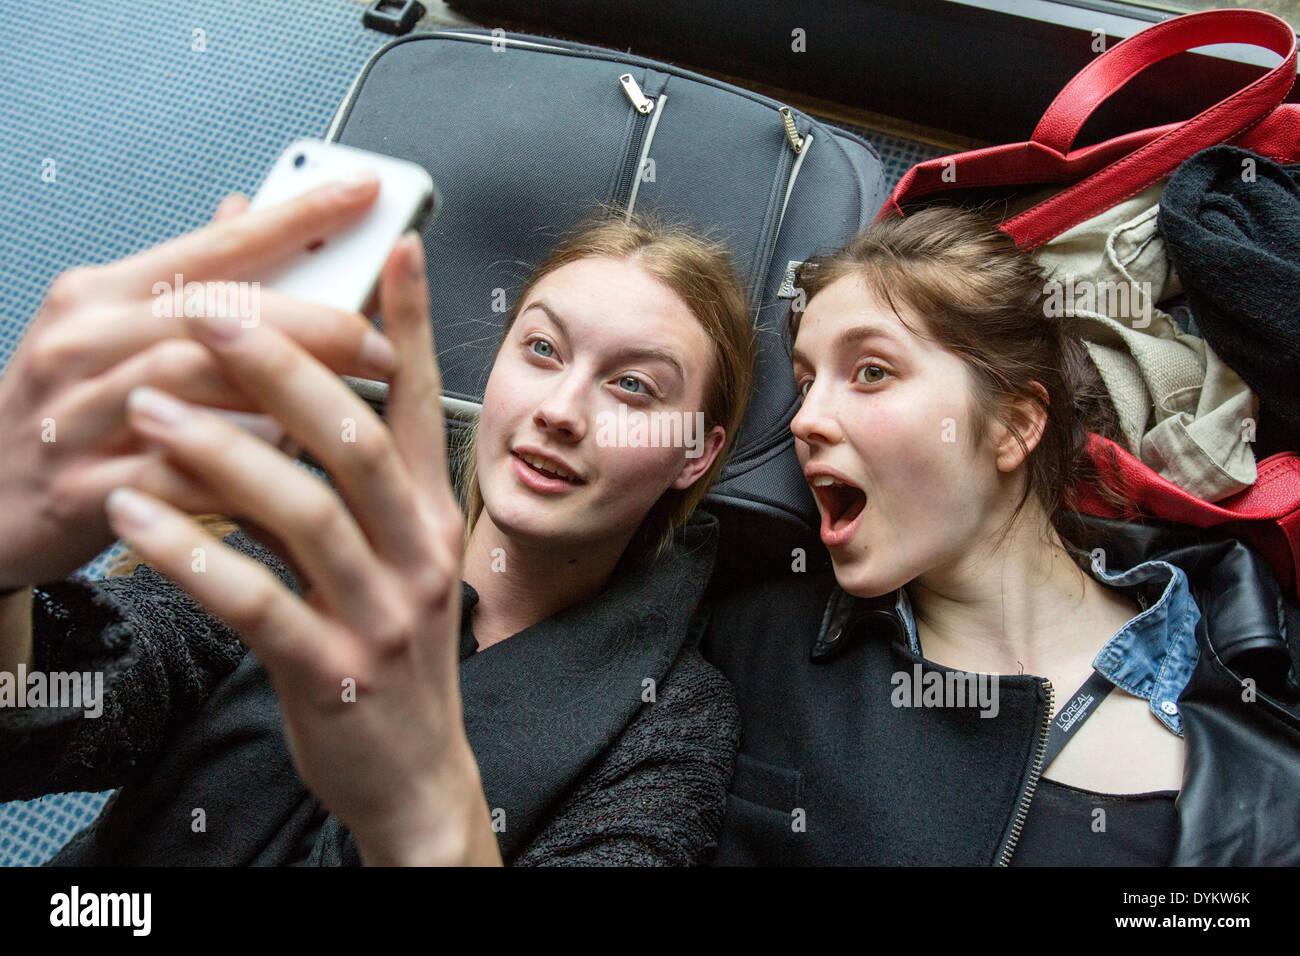 Selfie, models, backstage, phone - Stock Image